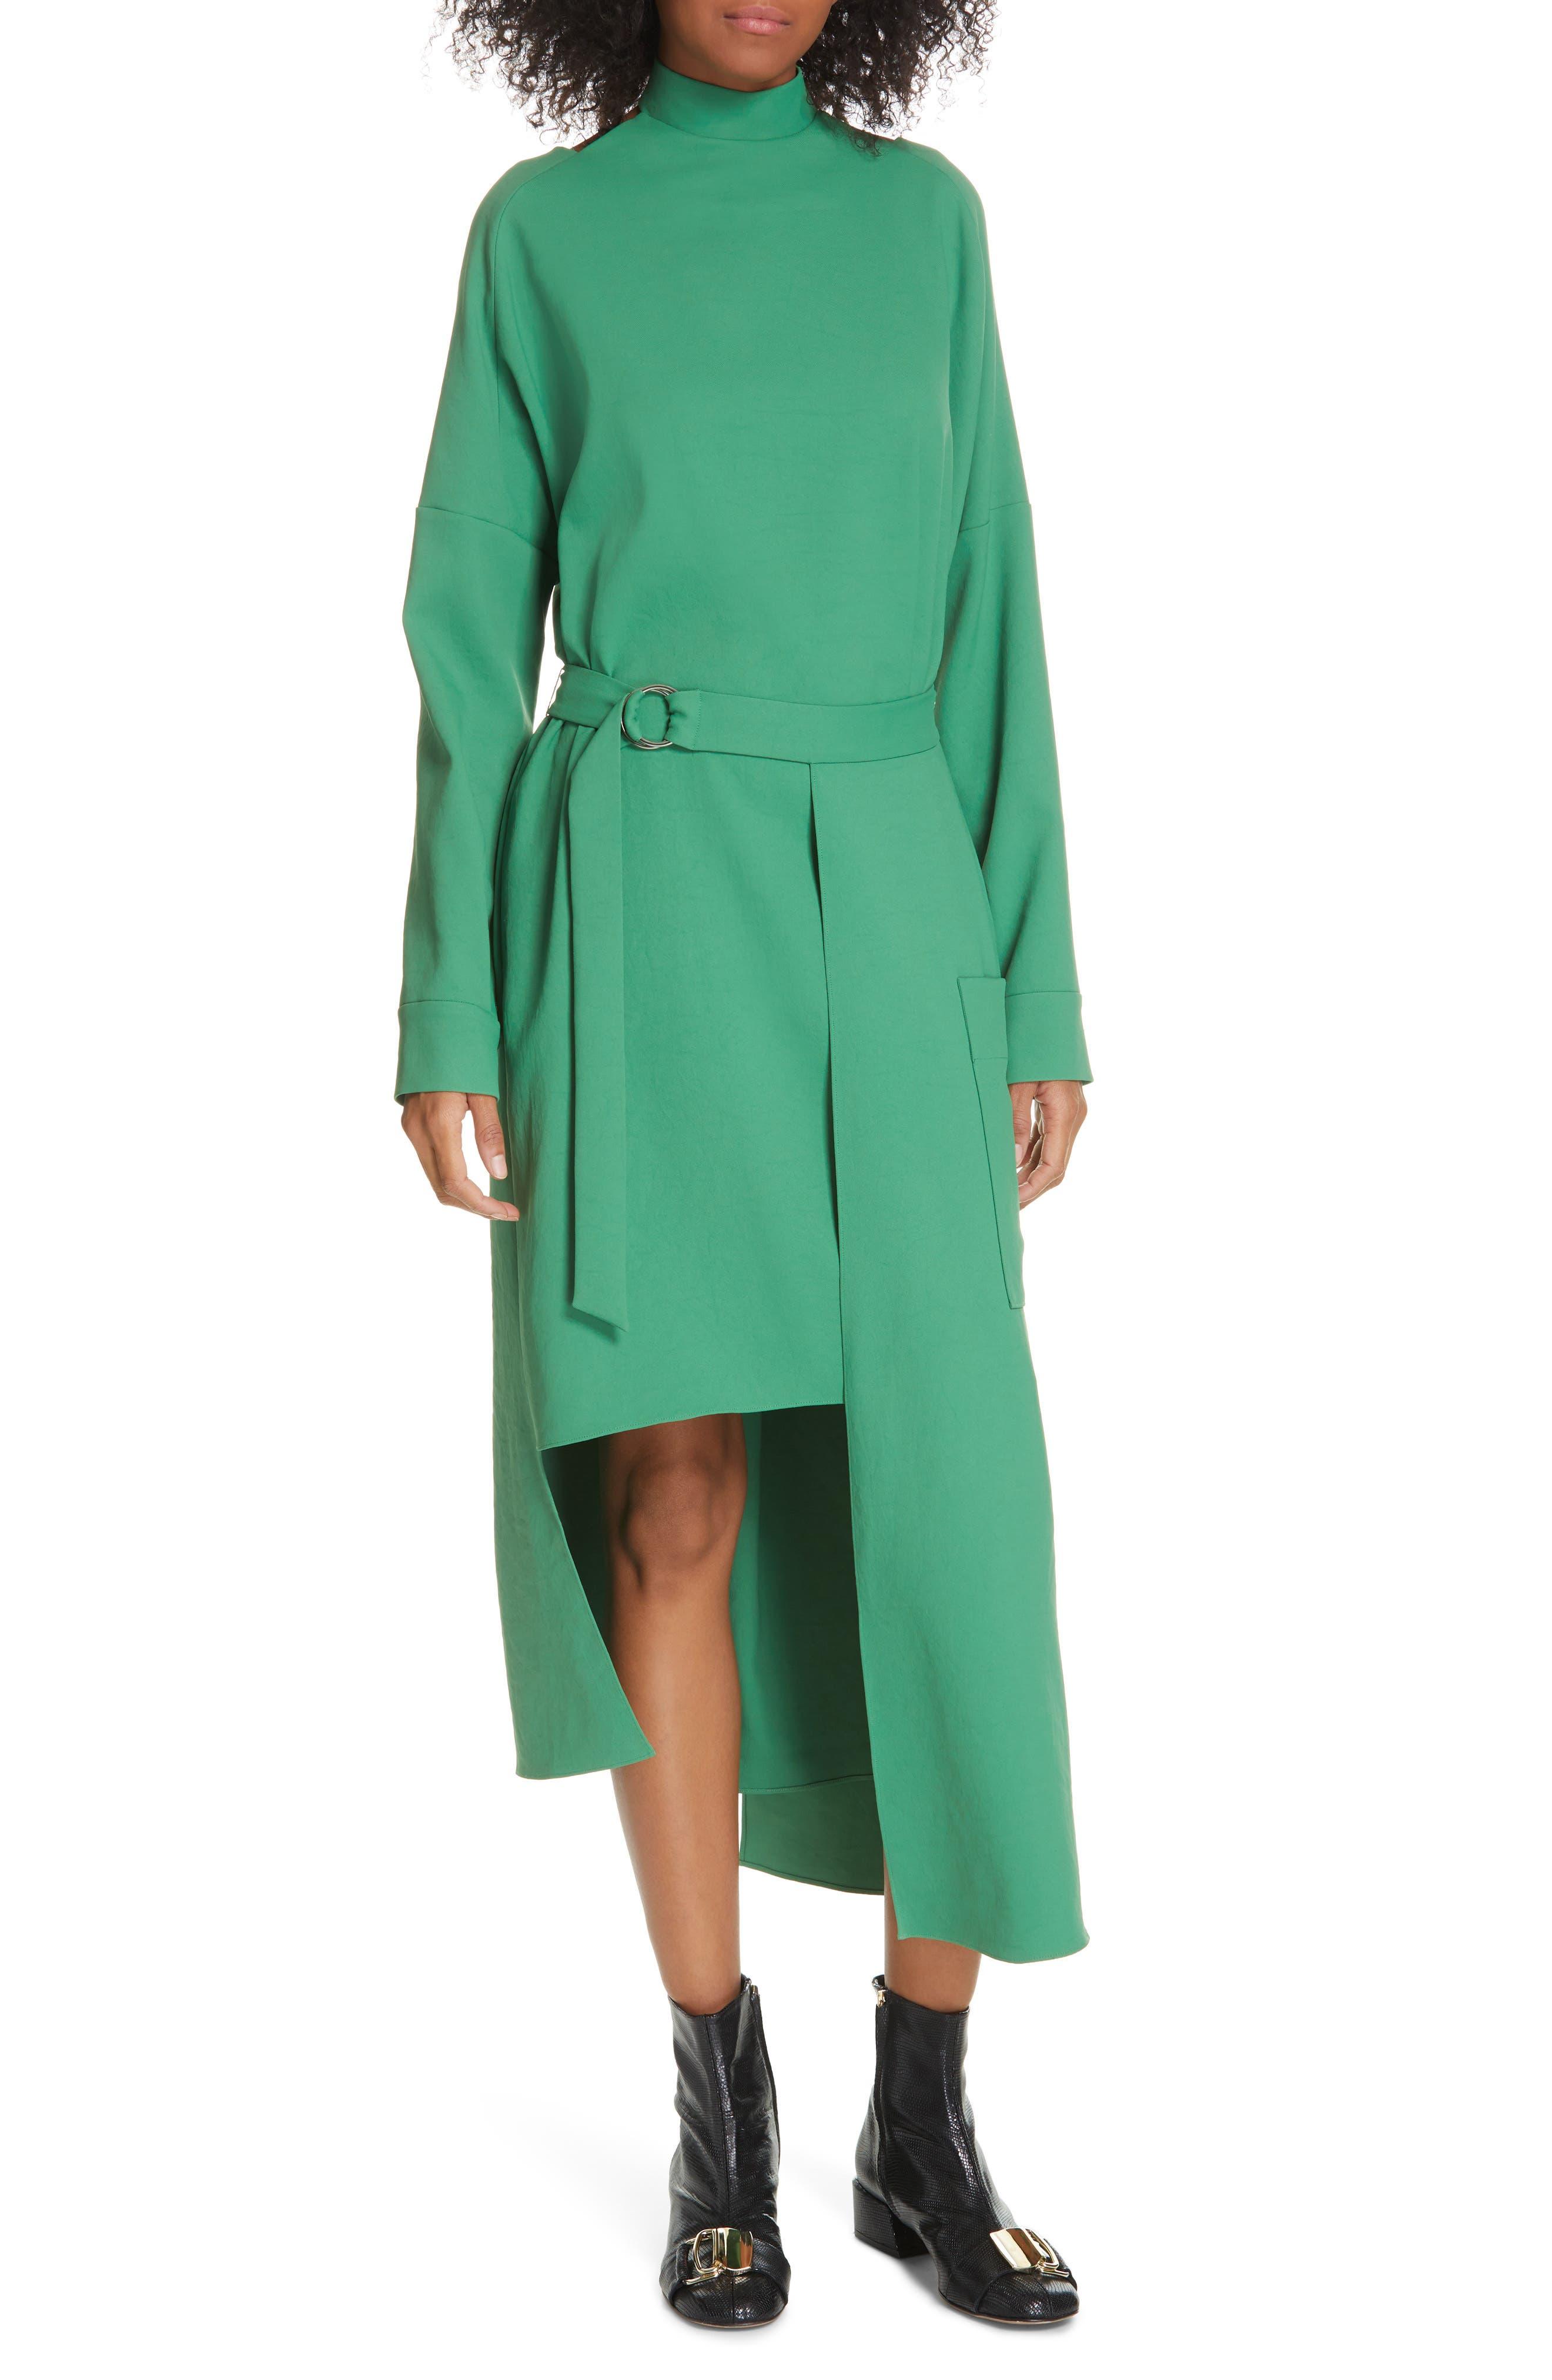 Tibi Chalky Drape Cutout Long Sleeve Dress, Green